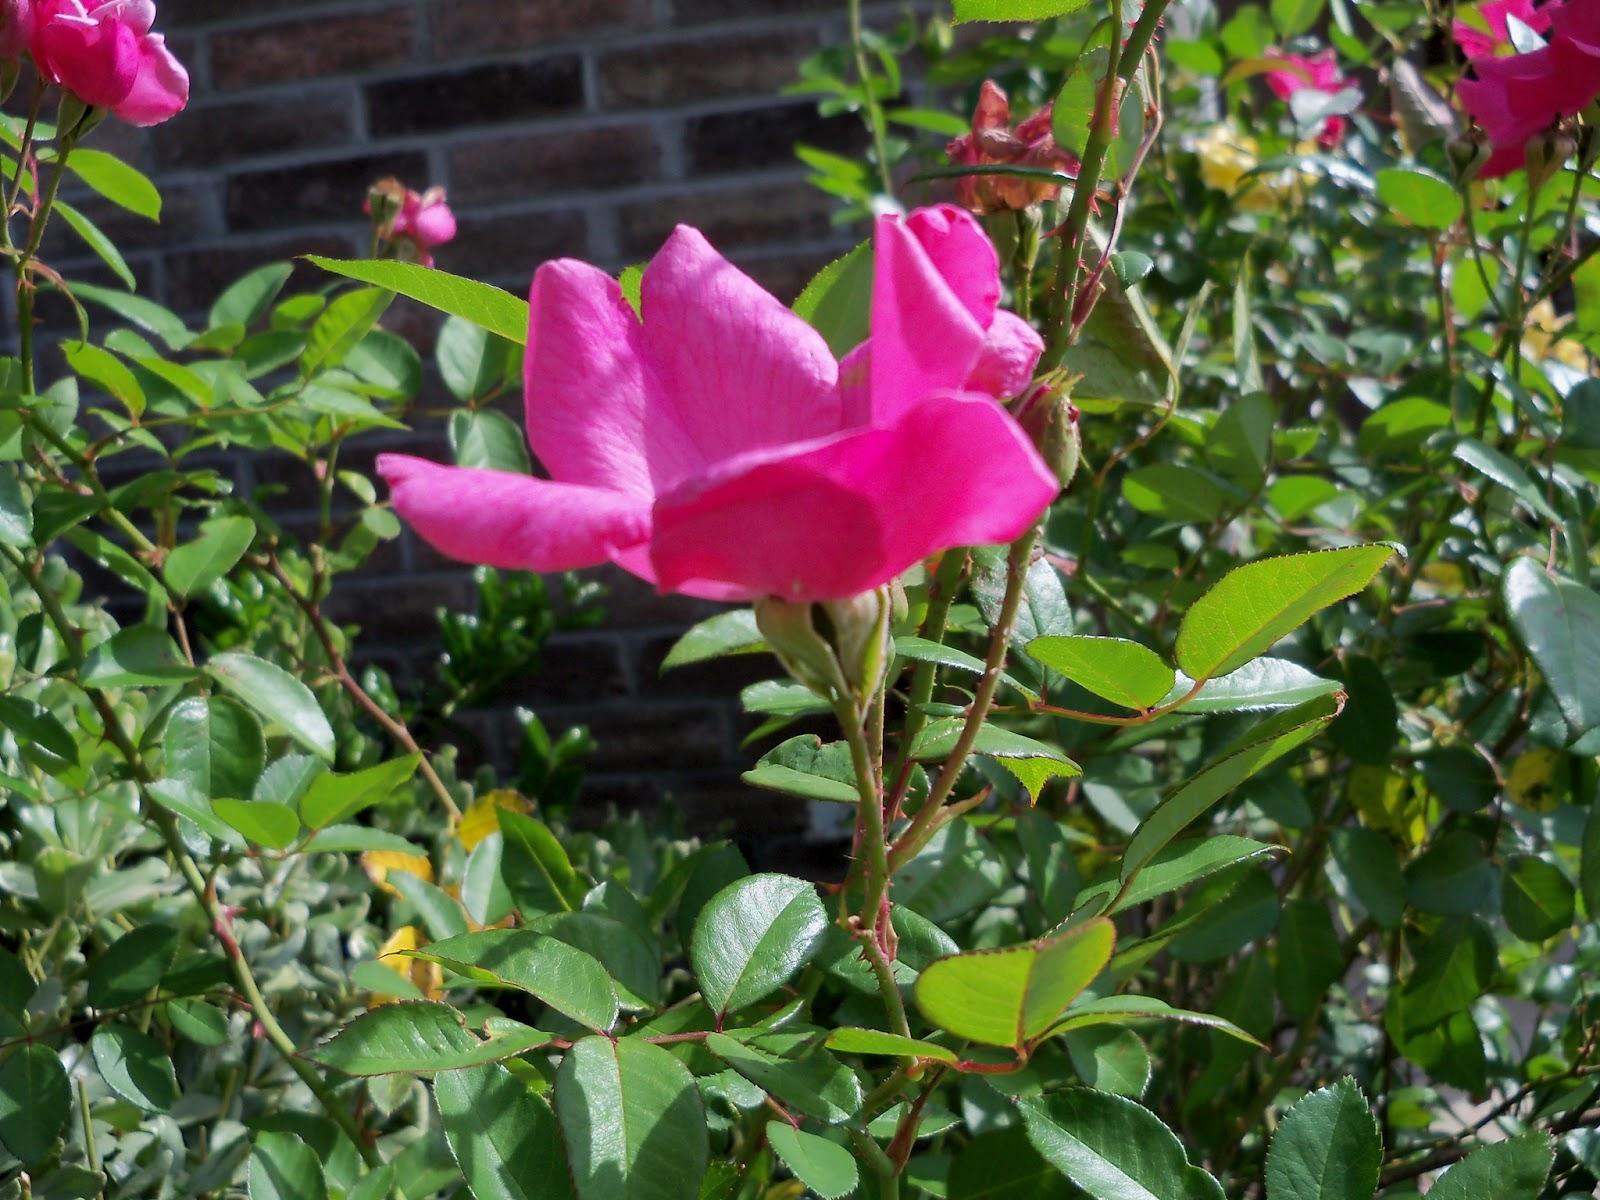 Gardening 2012 - 115_1703.JPG